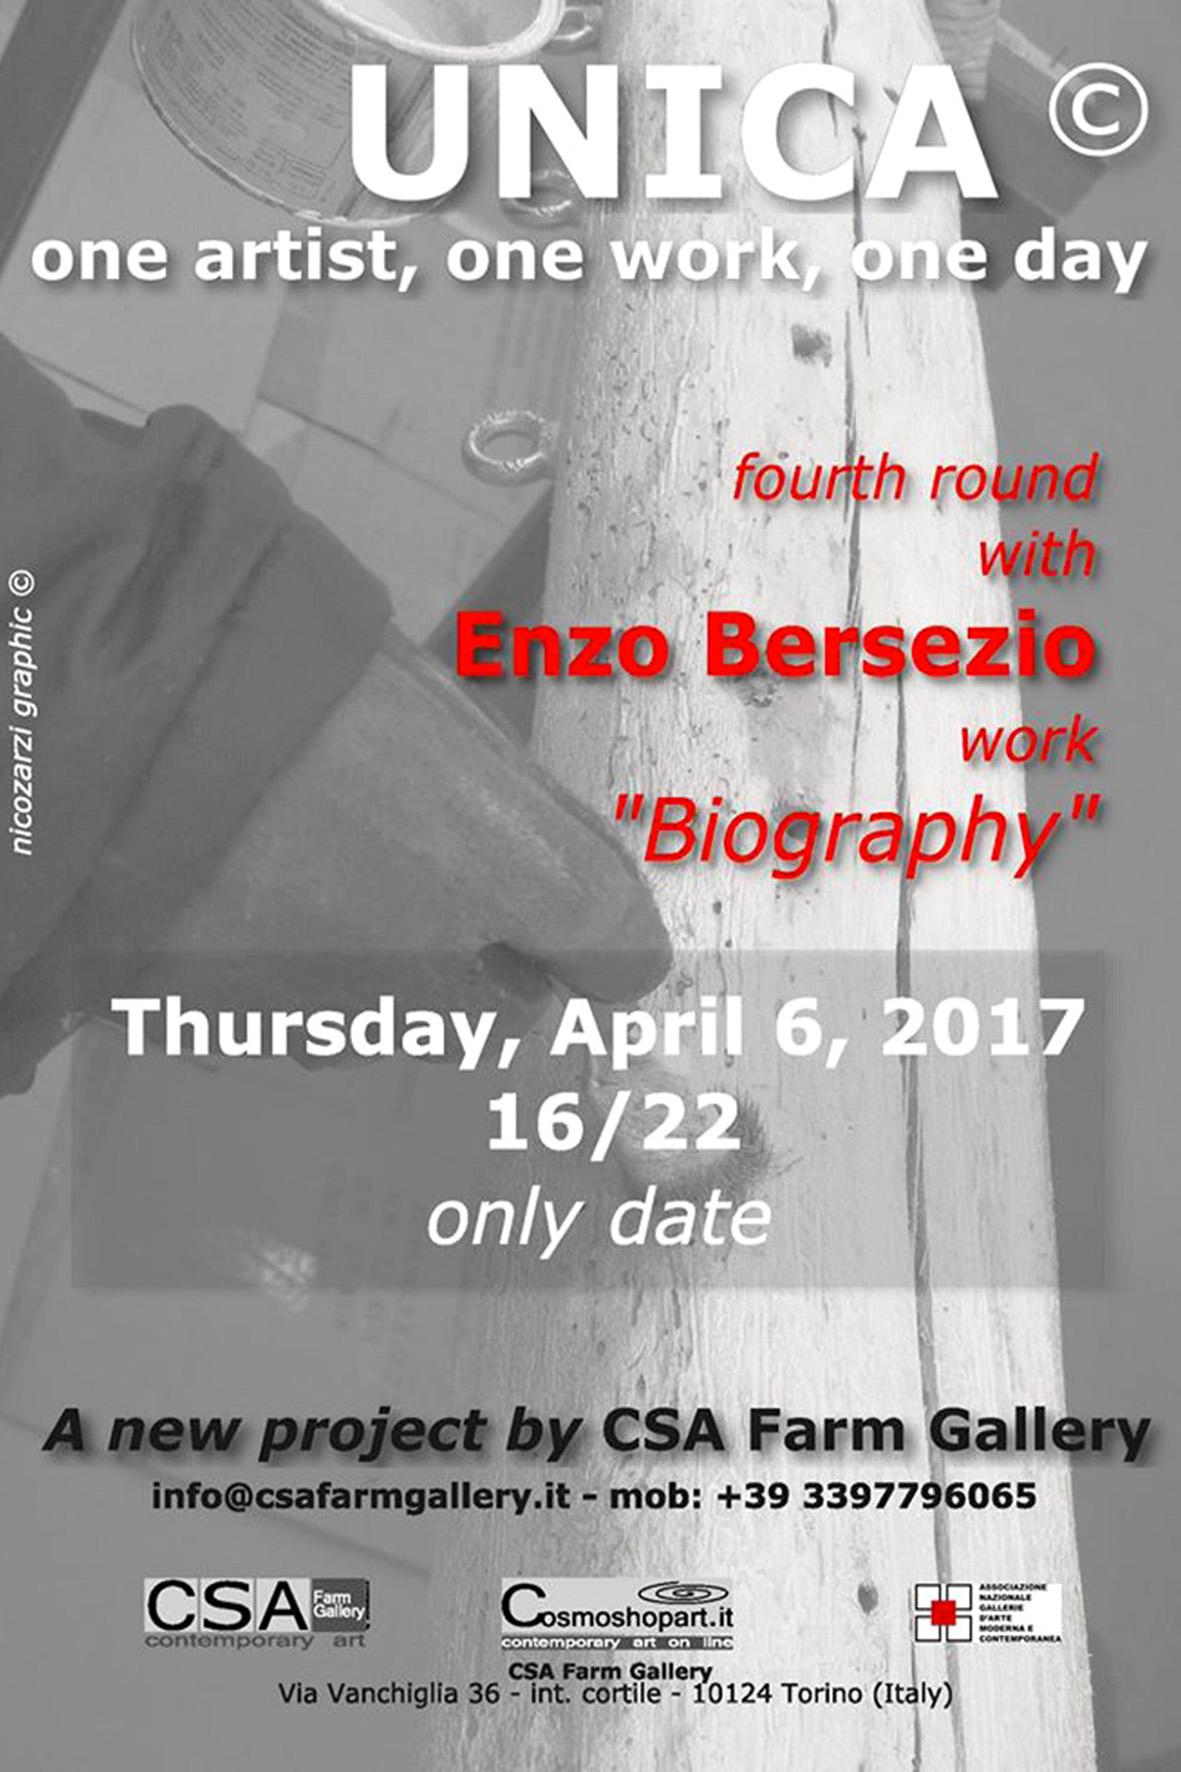 'Unica', Enzo Bersezio, 06/04/2017 © E.Bersezio/NicoZarzi/CSA